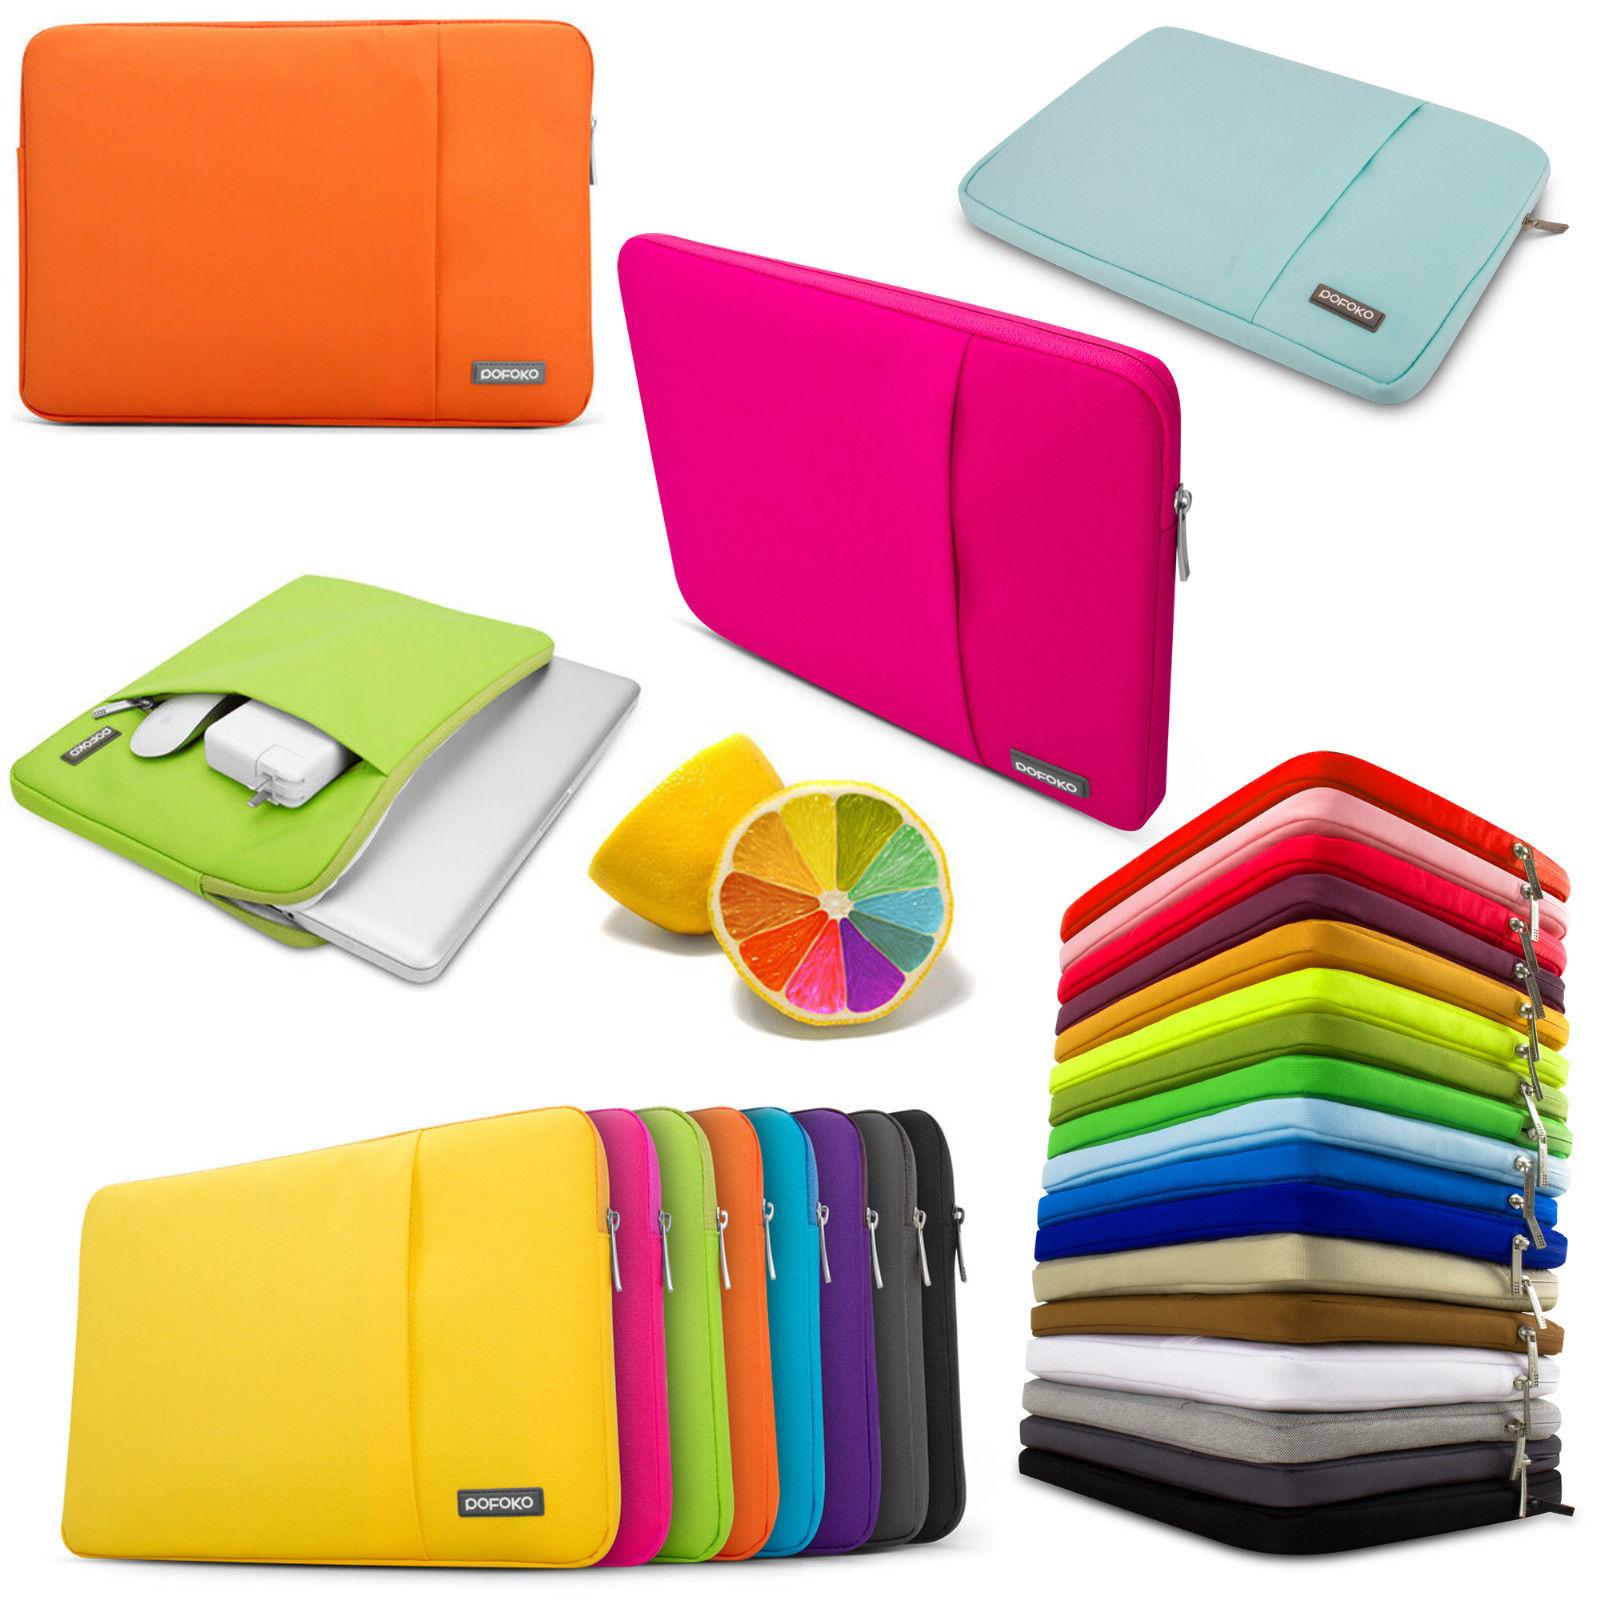 Notebook samsung brasil - 11 13 14 15 15 6 Laptop Bag Sleeve Case Cover For Dell